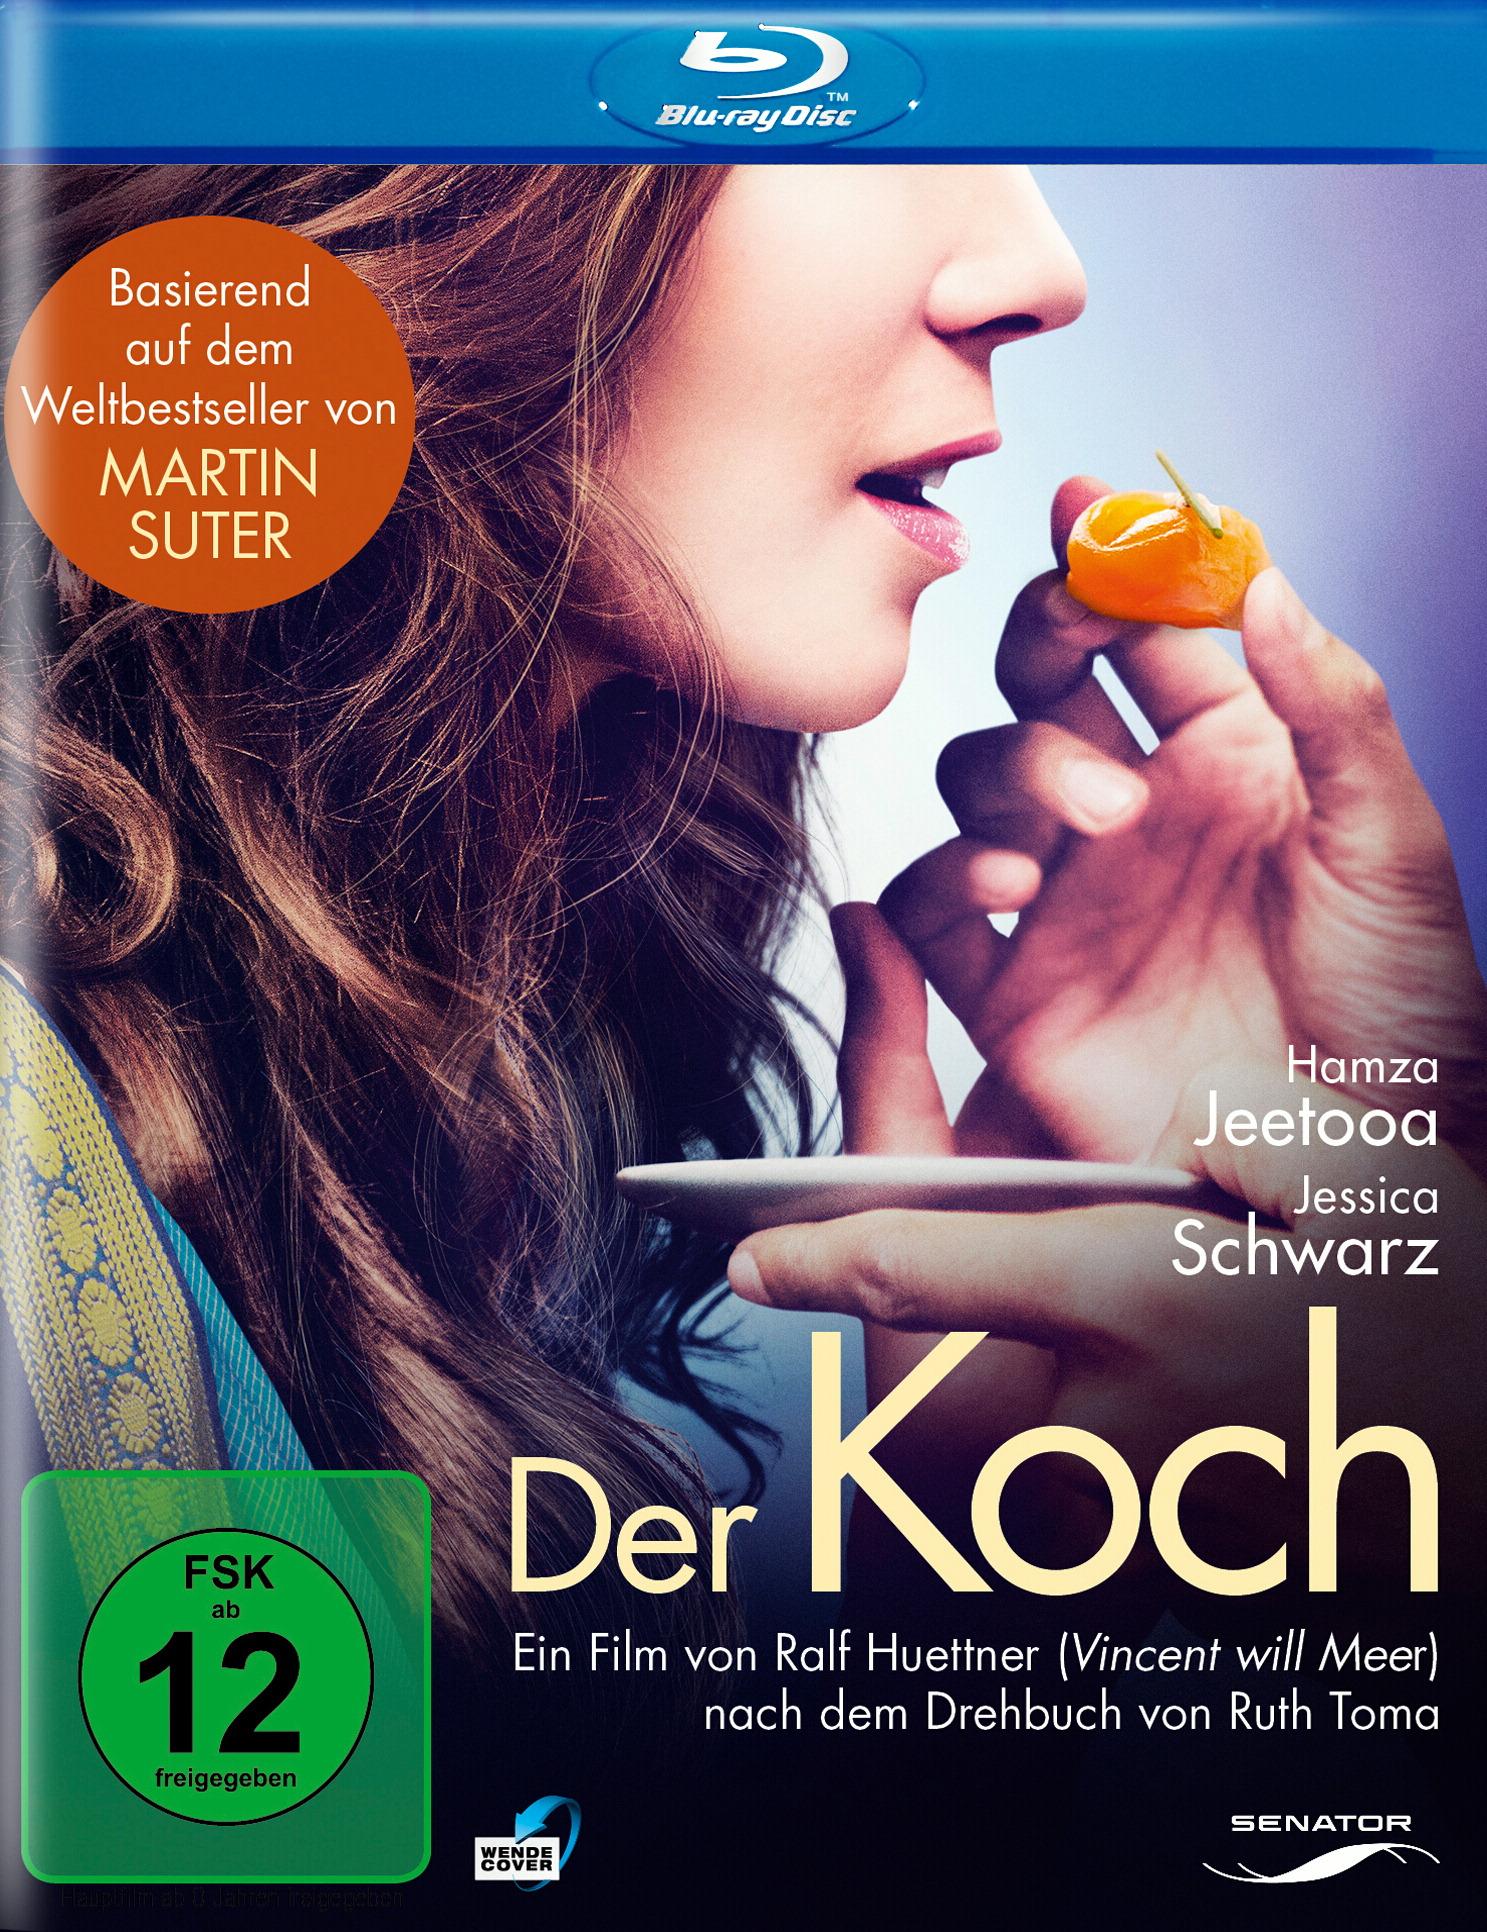 Der Koch Poster